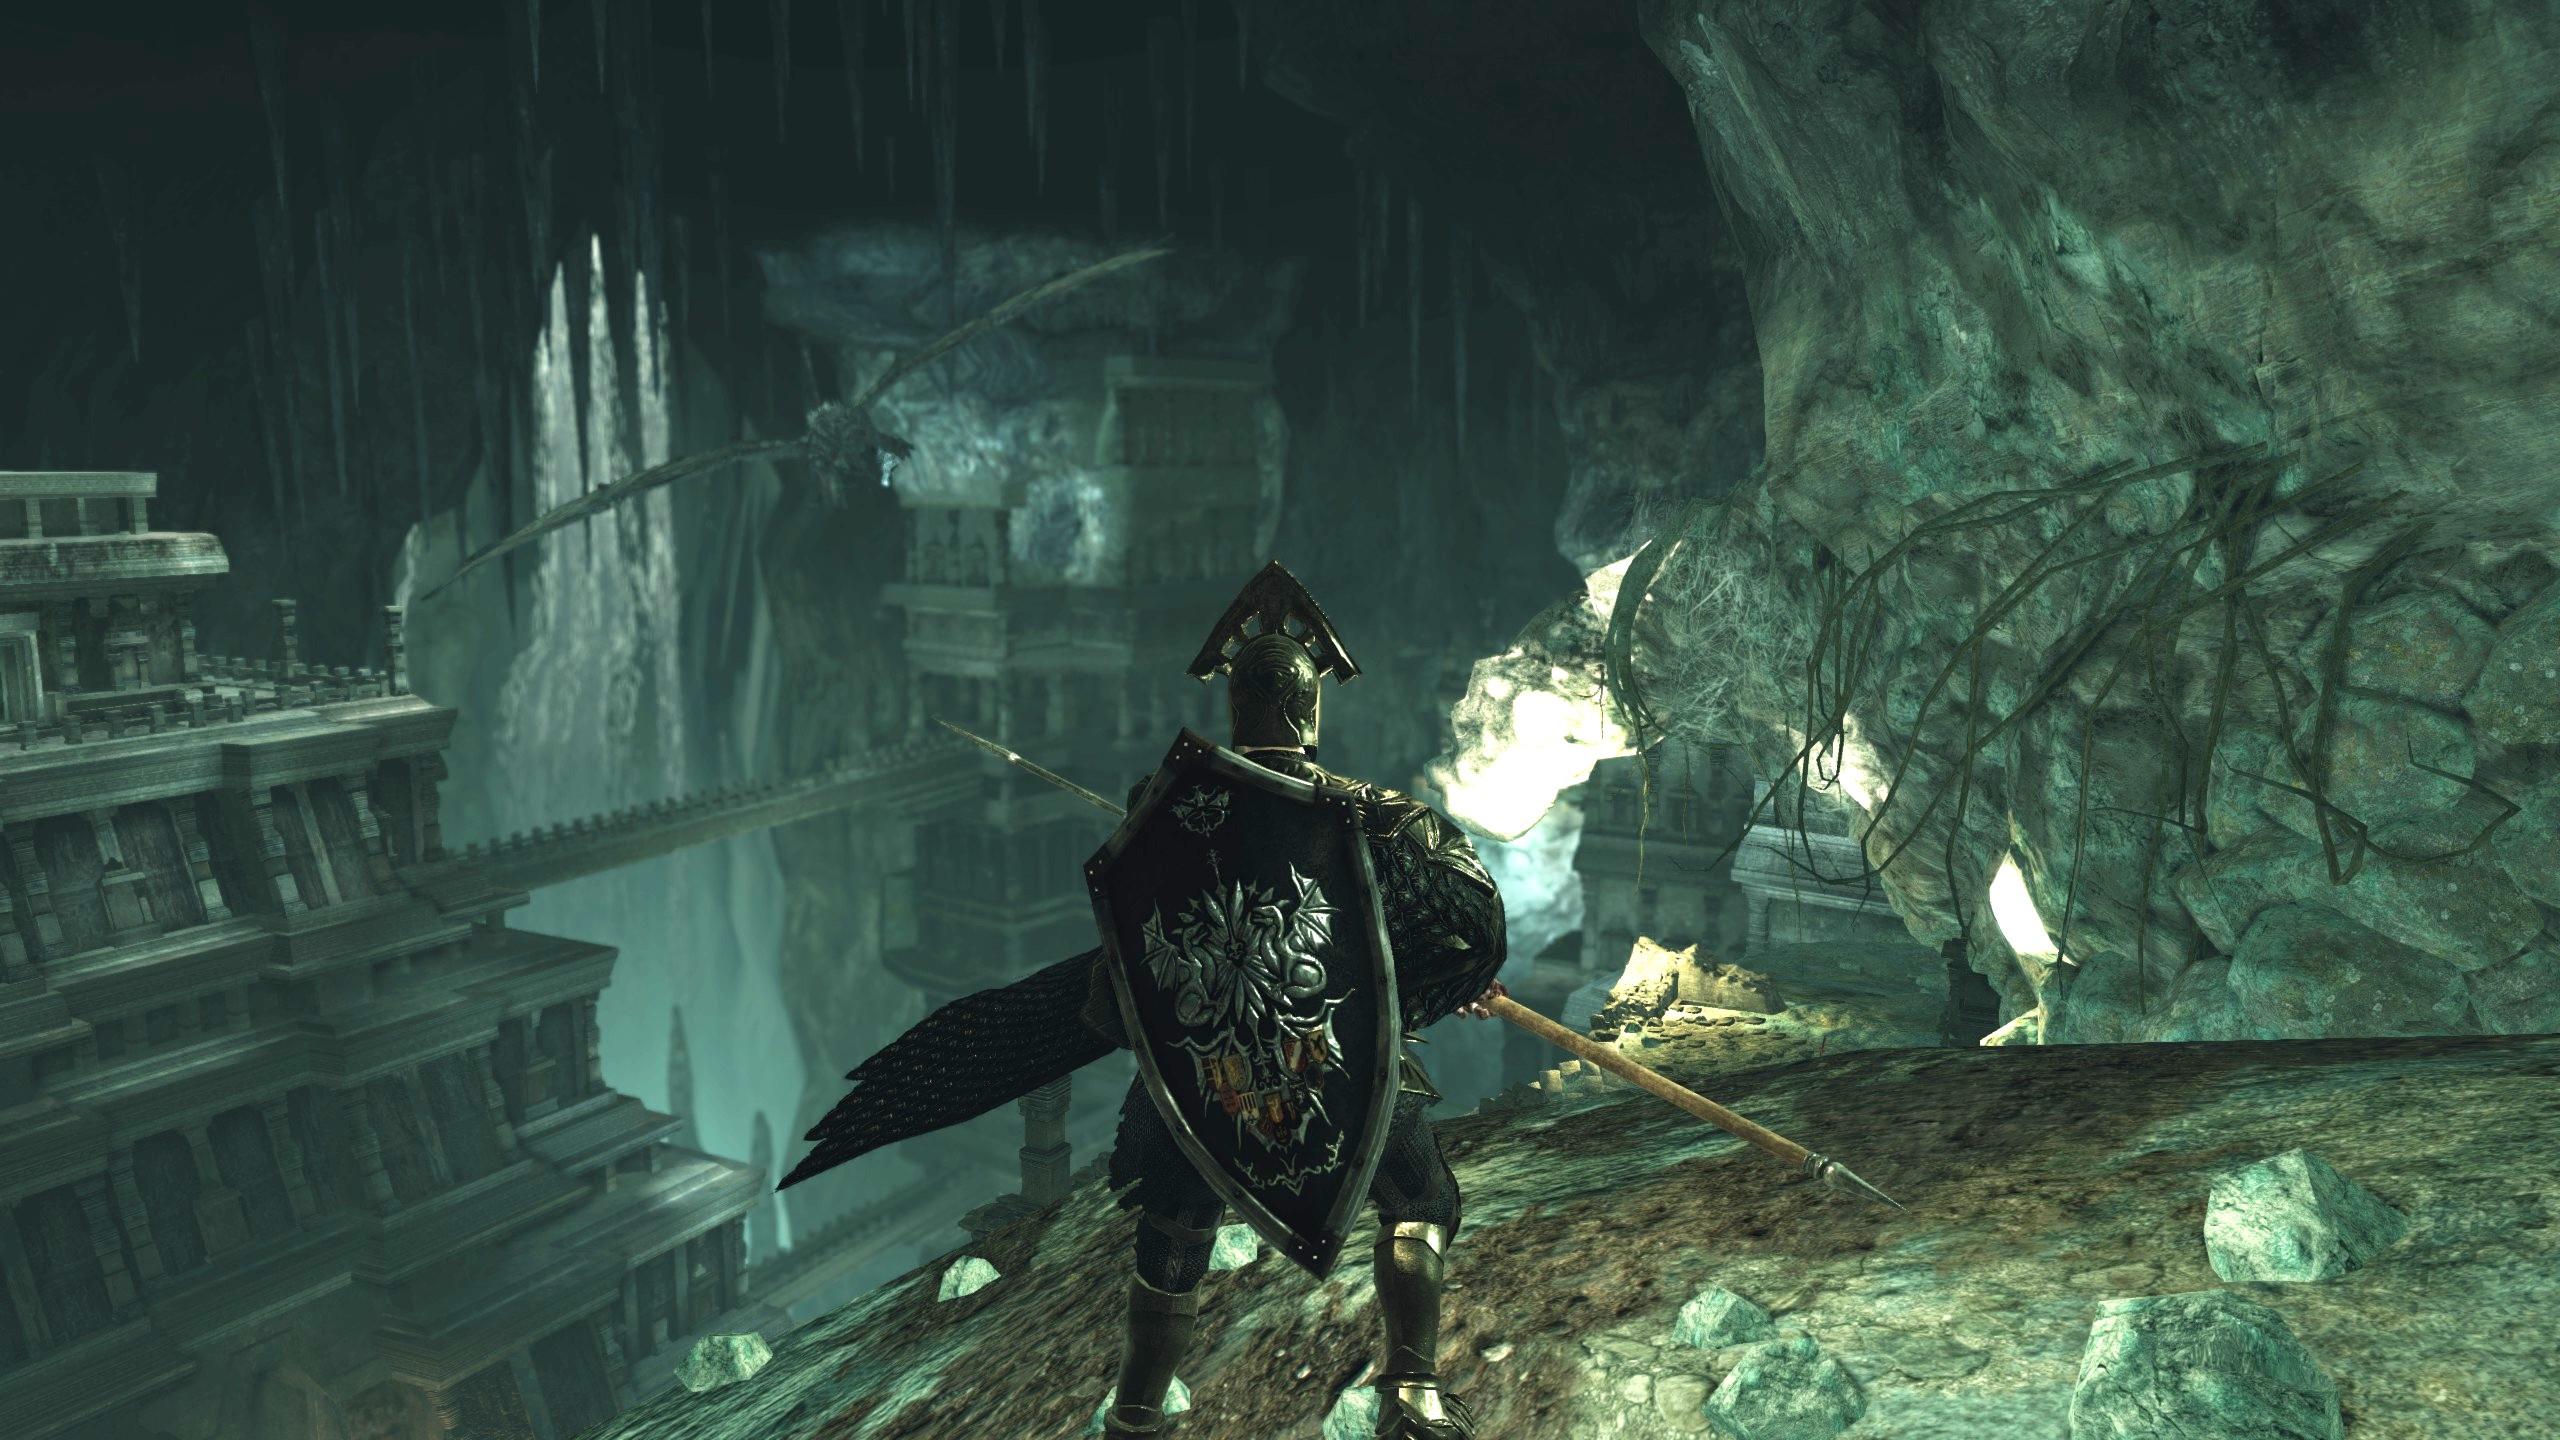 Dark Souls 2: Crown of the Sunken King guide